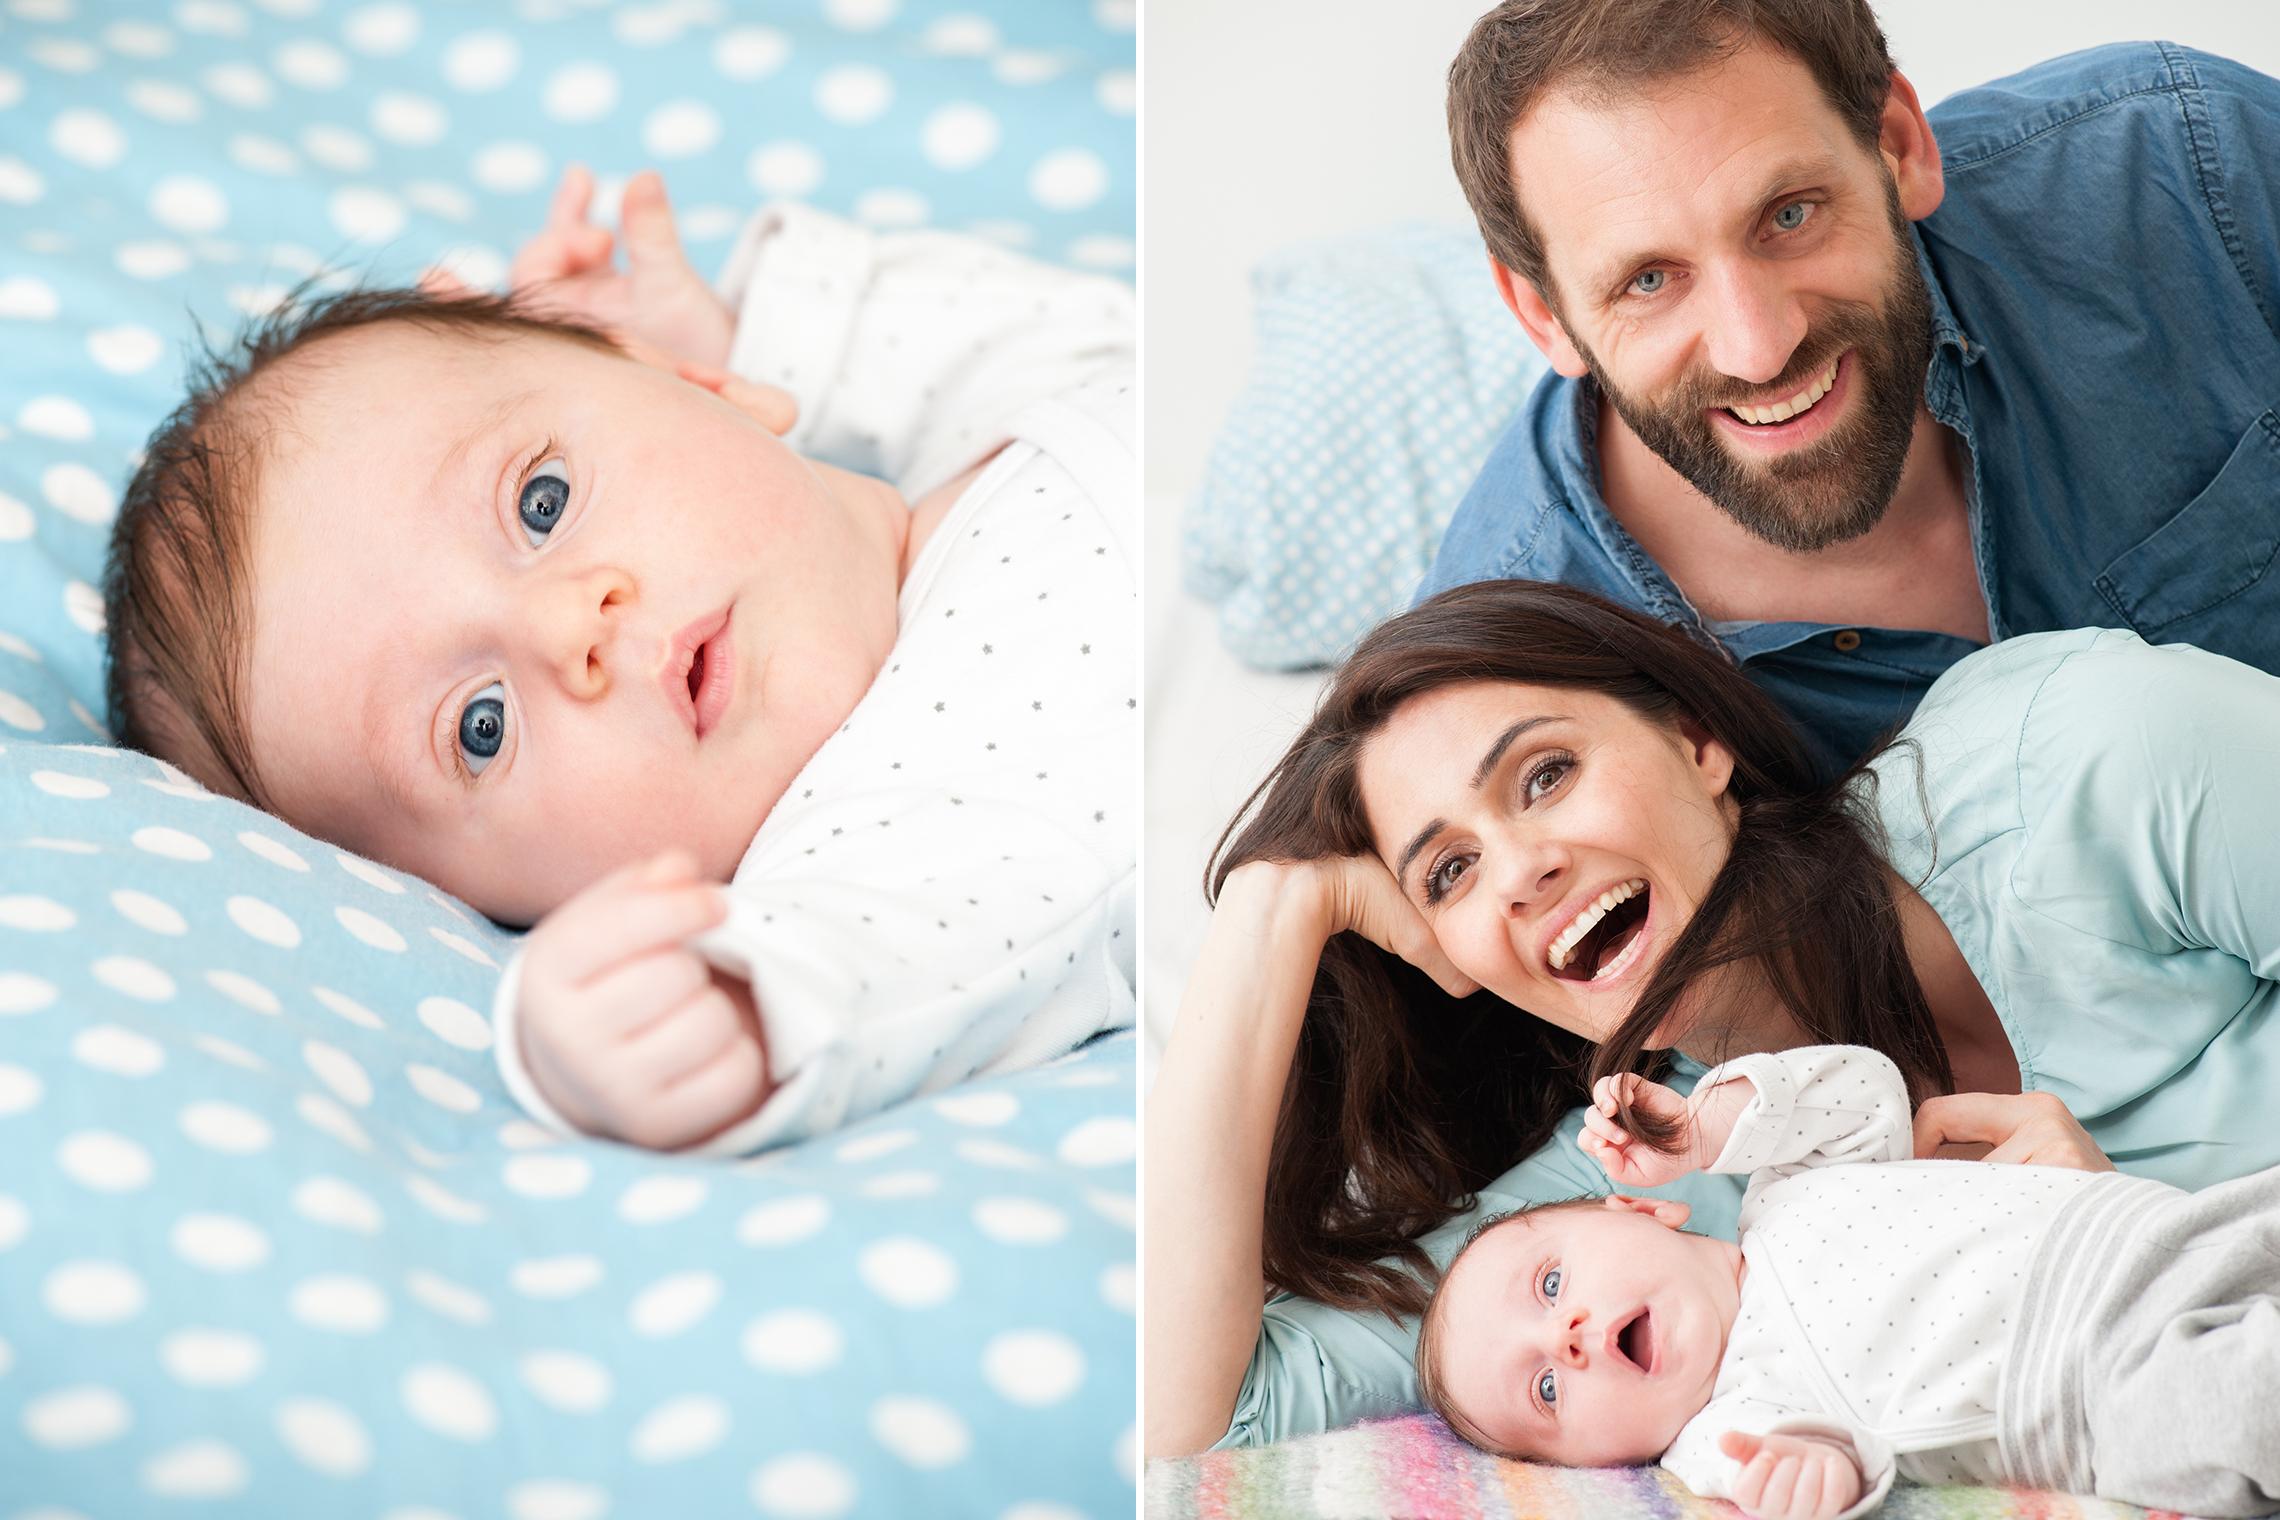 Familyportraits Portraitfotografie Caro Hoene Photography Berlin